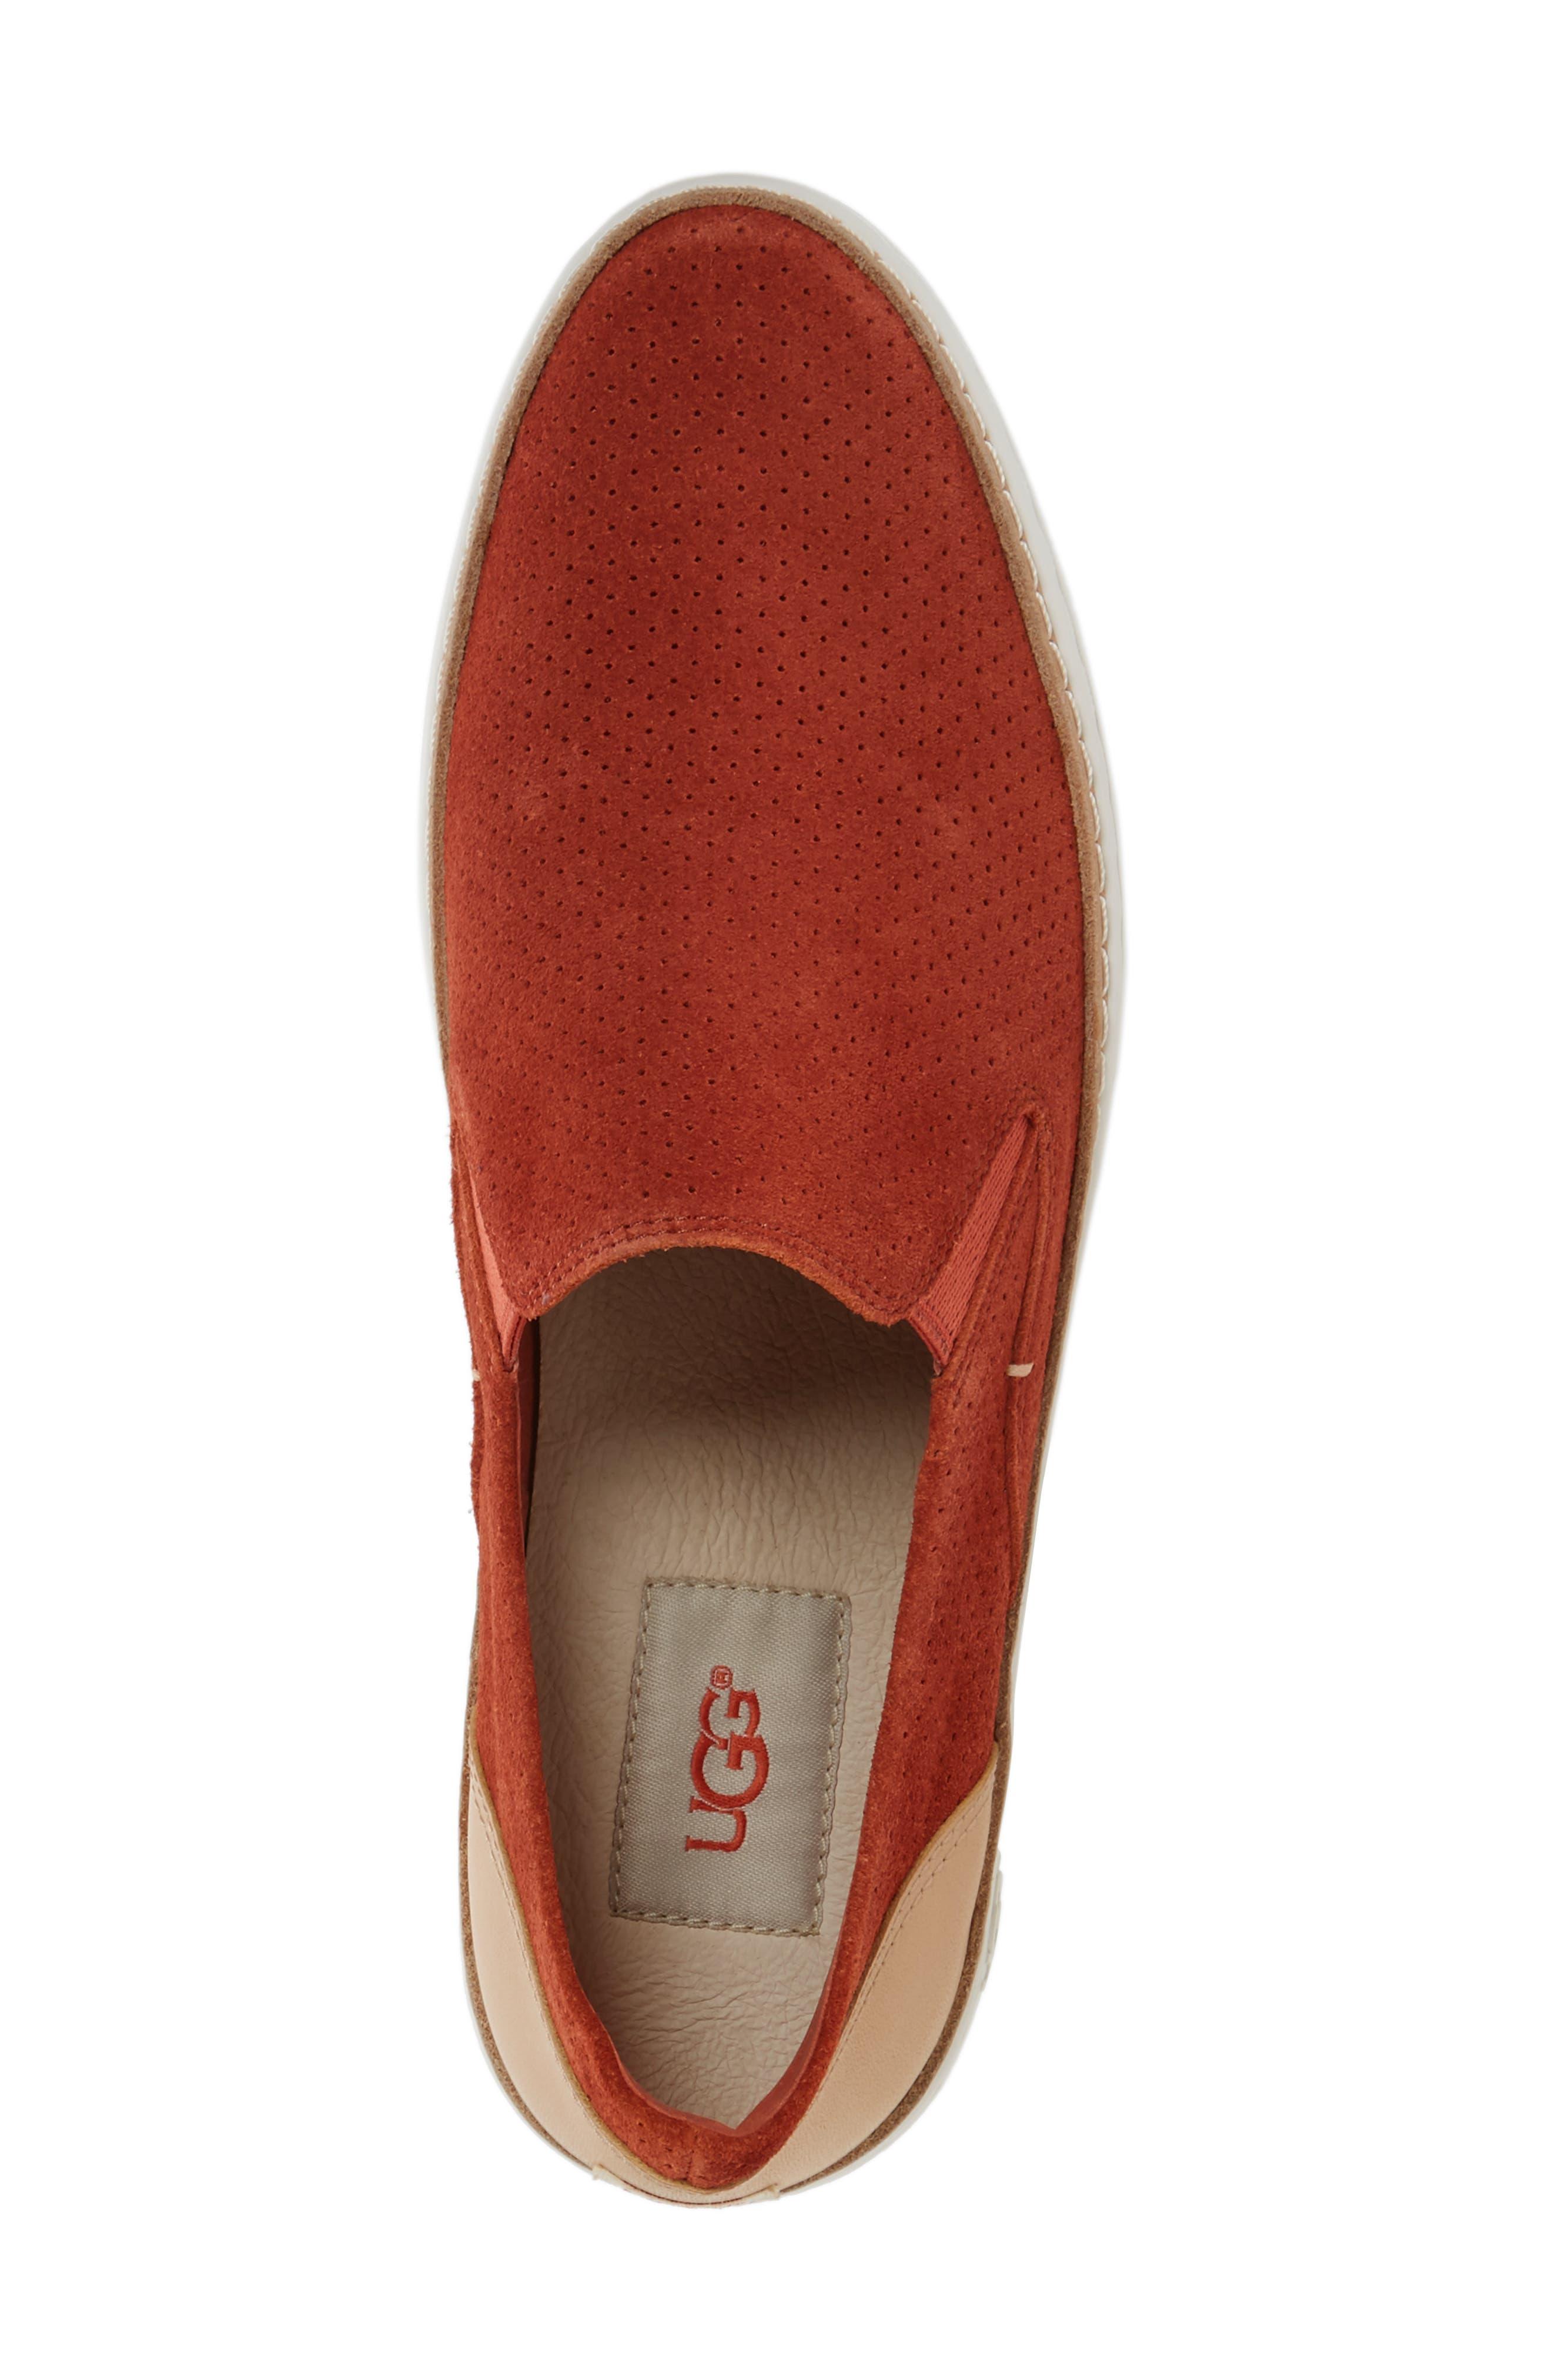 Adley Slip-On Sneaker,                             Alternate thumbnail 5, color,                             Paprika Suede